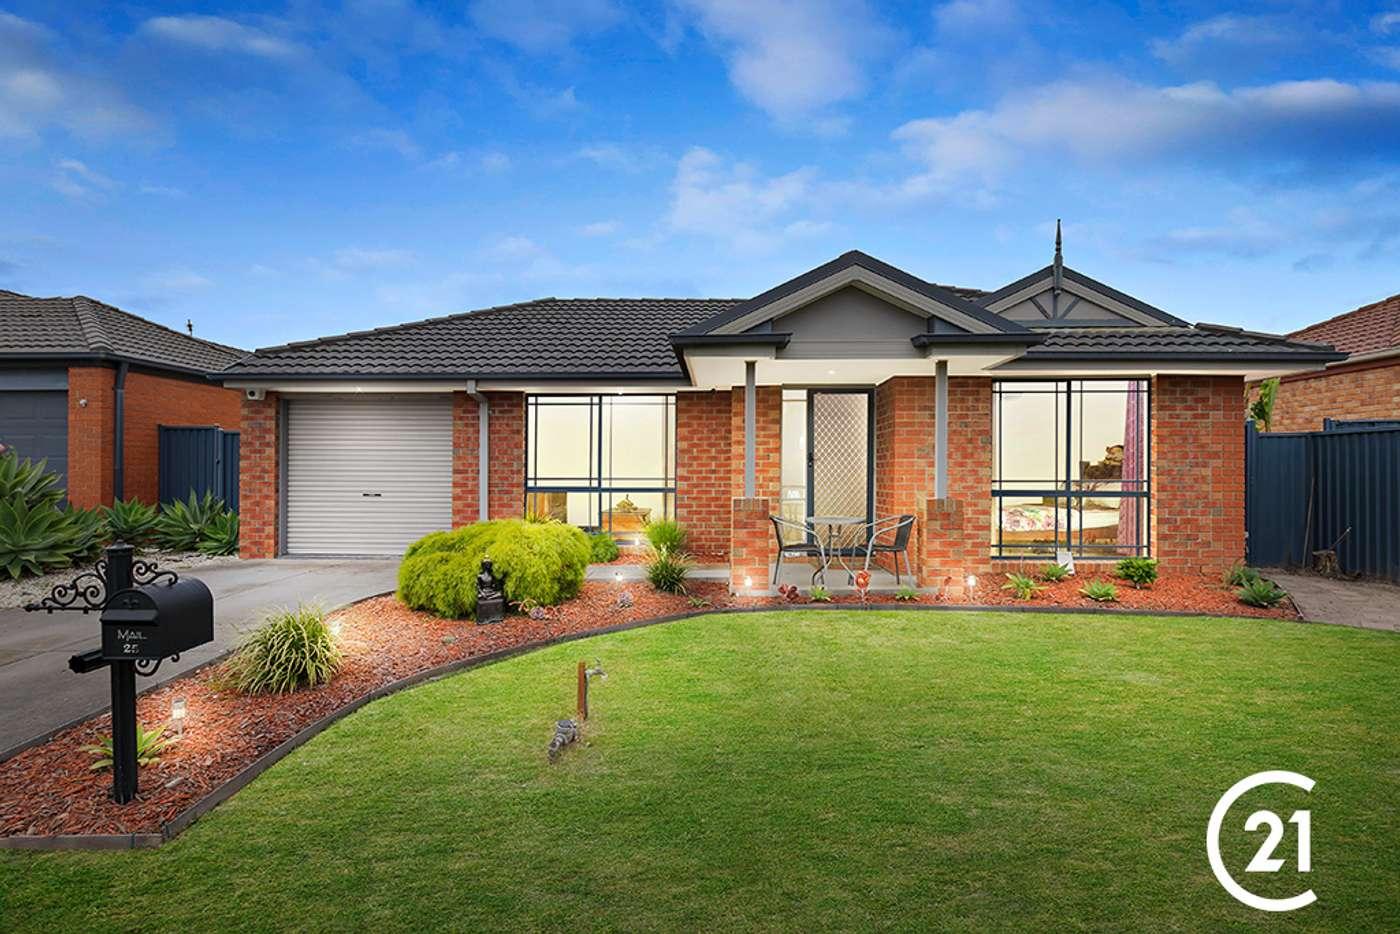 Main view of Homely house listing, 25 Stringy Bark Circuit, Pakenham VIC 3810